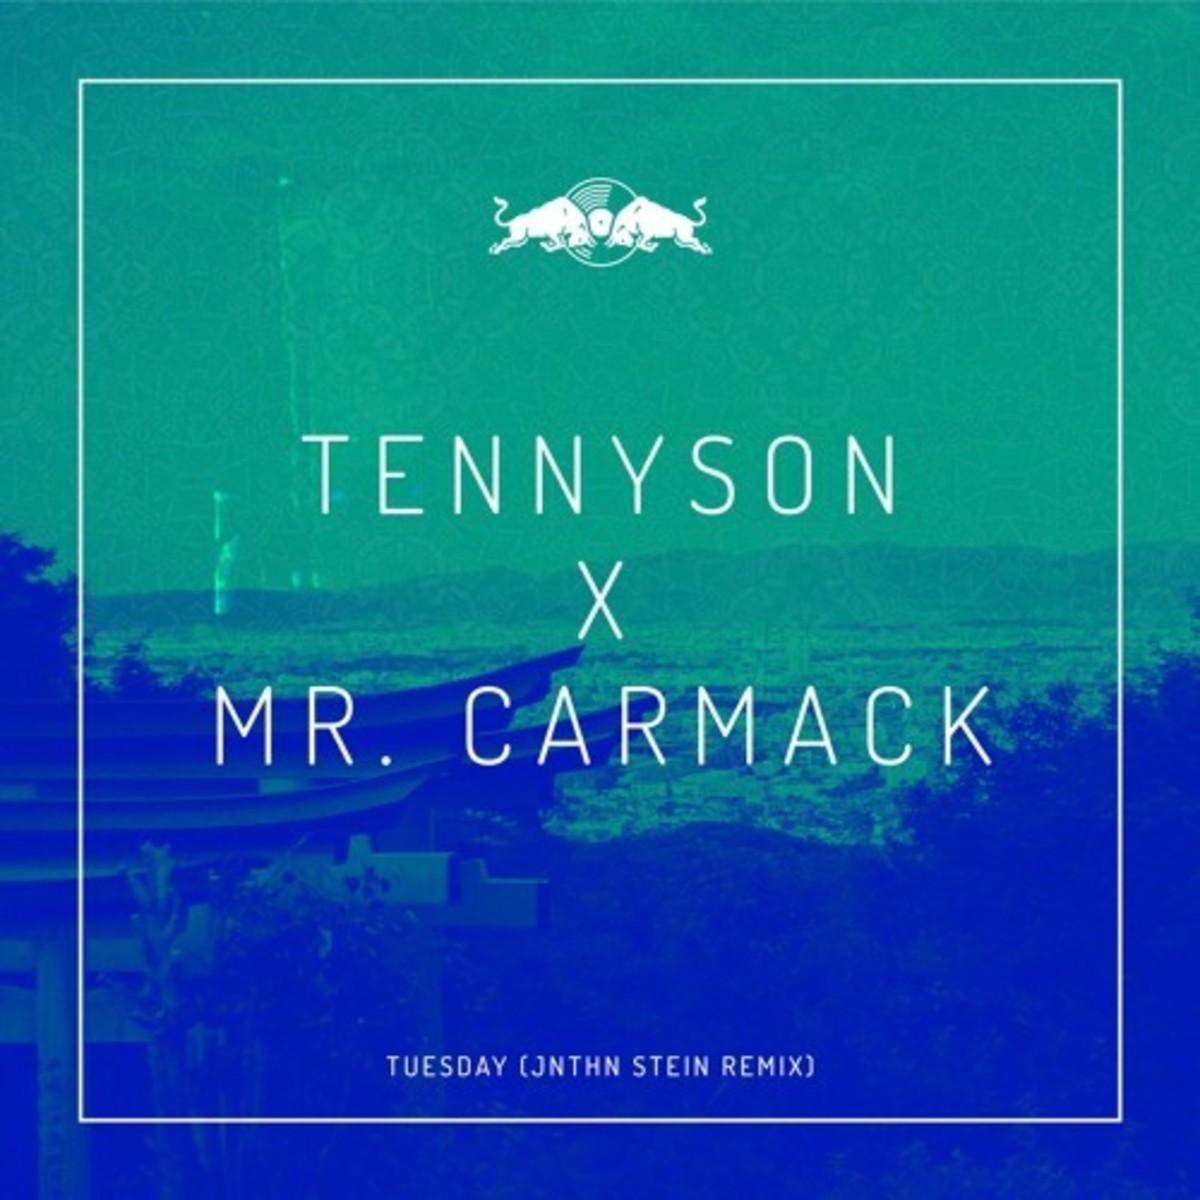 tennyson-mr-carmack-tuesday-remix.jpg